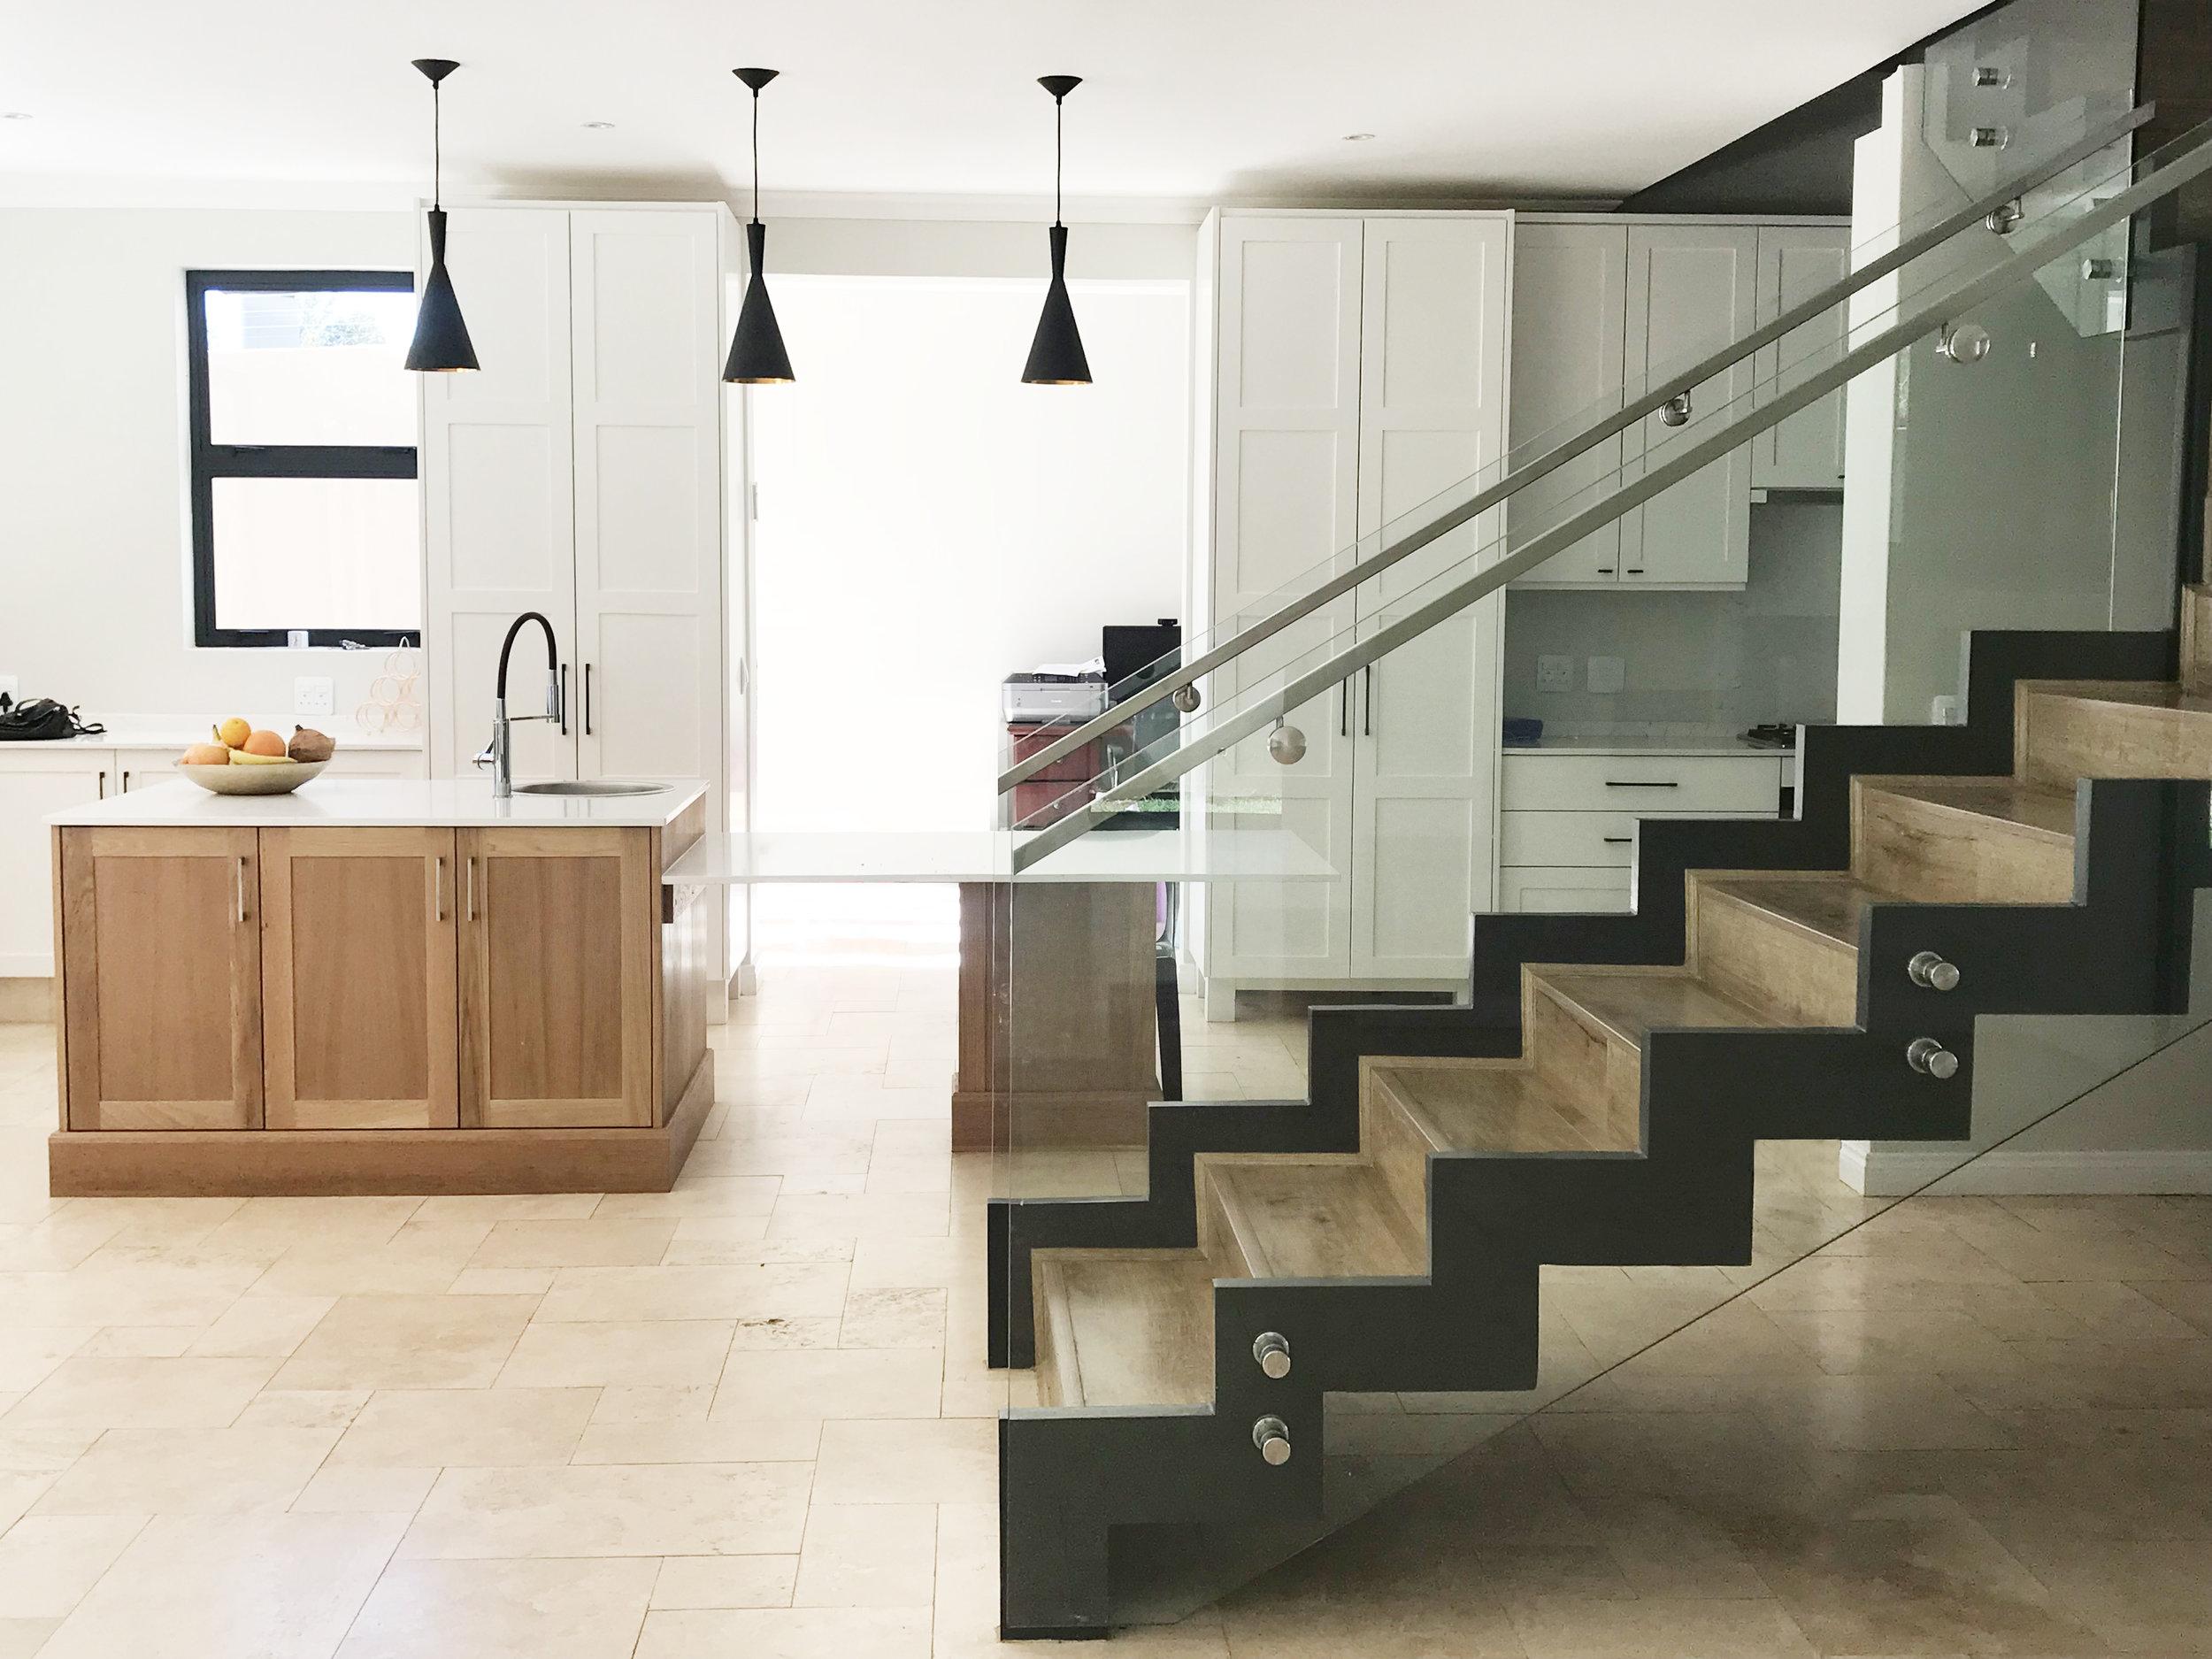 henrietta kitchen custom cabinetry cen interiors.jpg